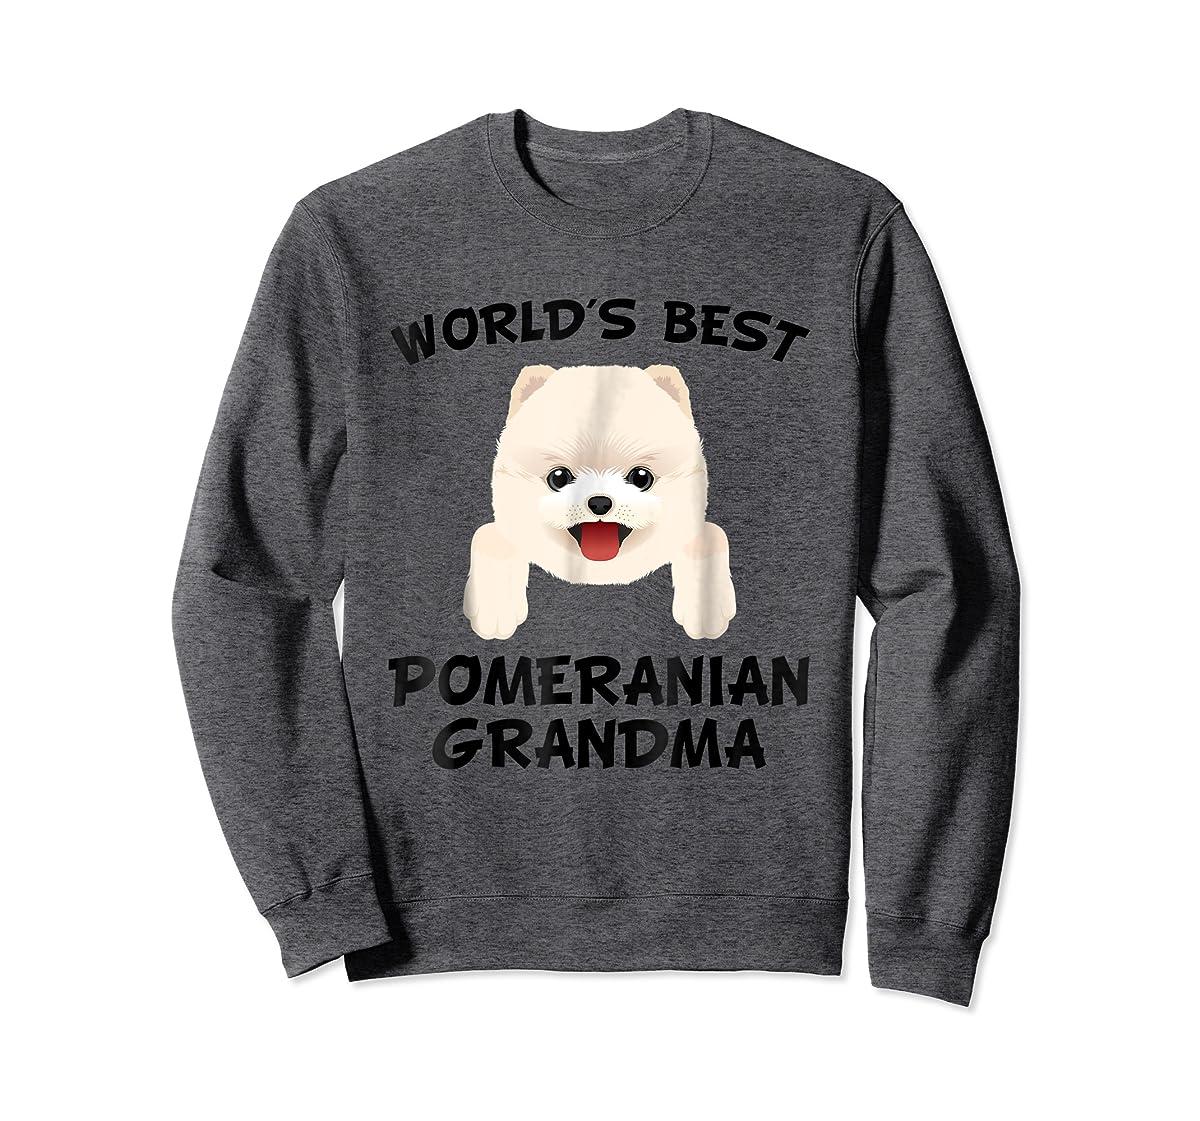 World's Best Pomeranian Grandma Dog Granddog T-Shirt-Sweatshirt-Dark Heather